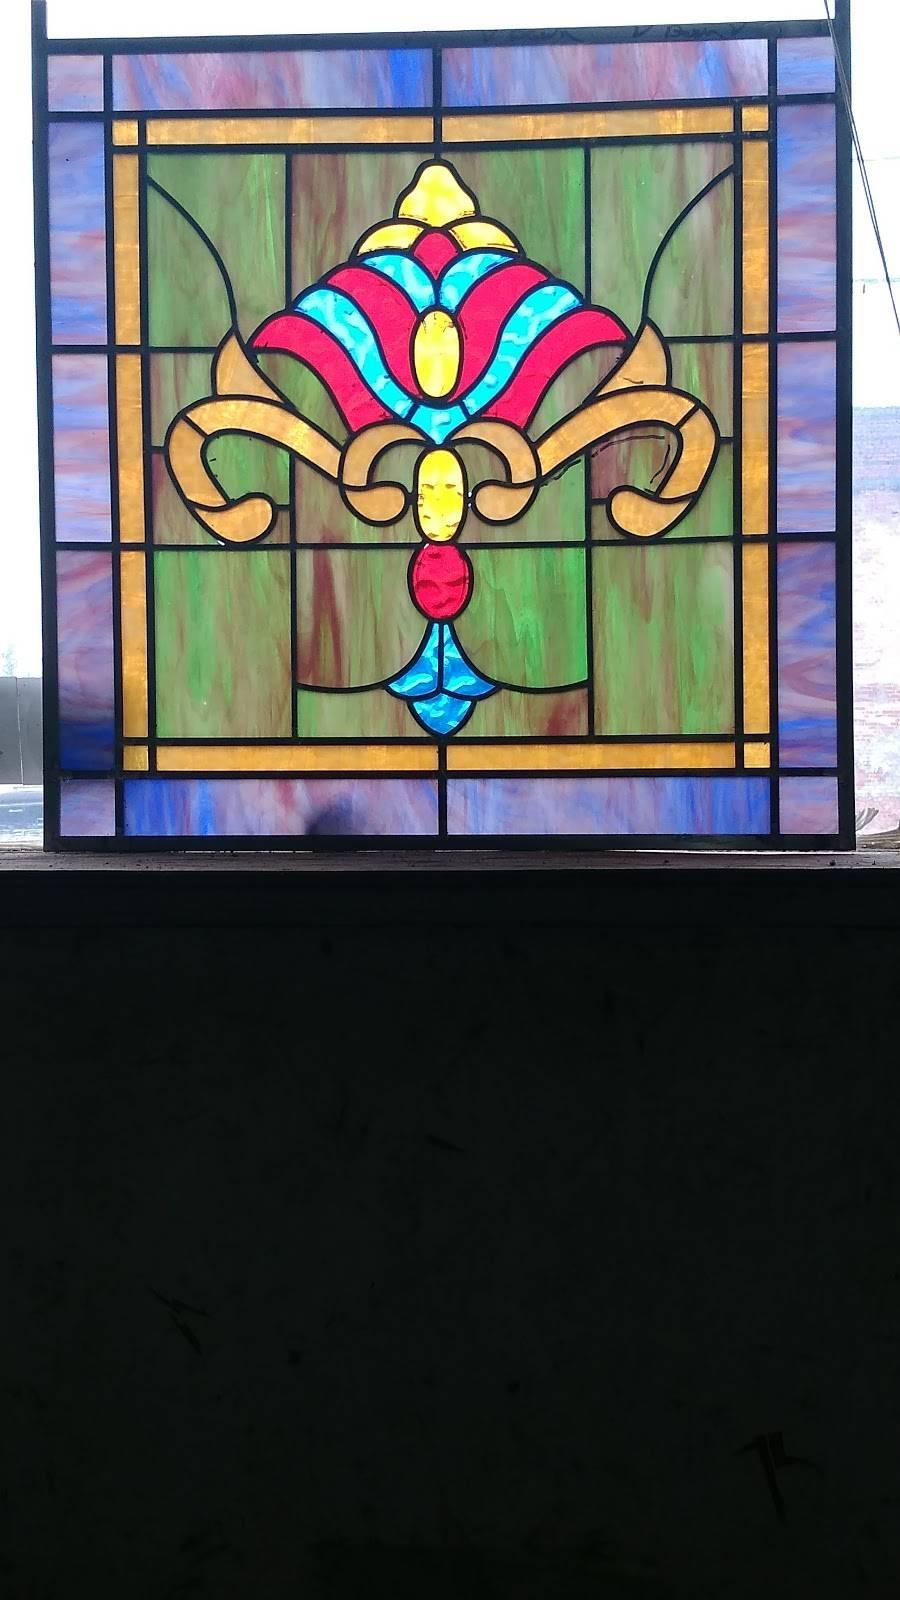 Birmingham Art Glass Inc - store  | Photo 7 of 9 | Address: 107 Ave U, Birmingham, AL 35214, USA | Phone: (205) 798-1081